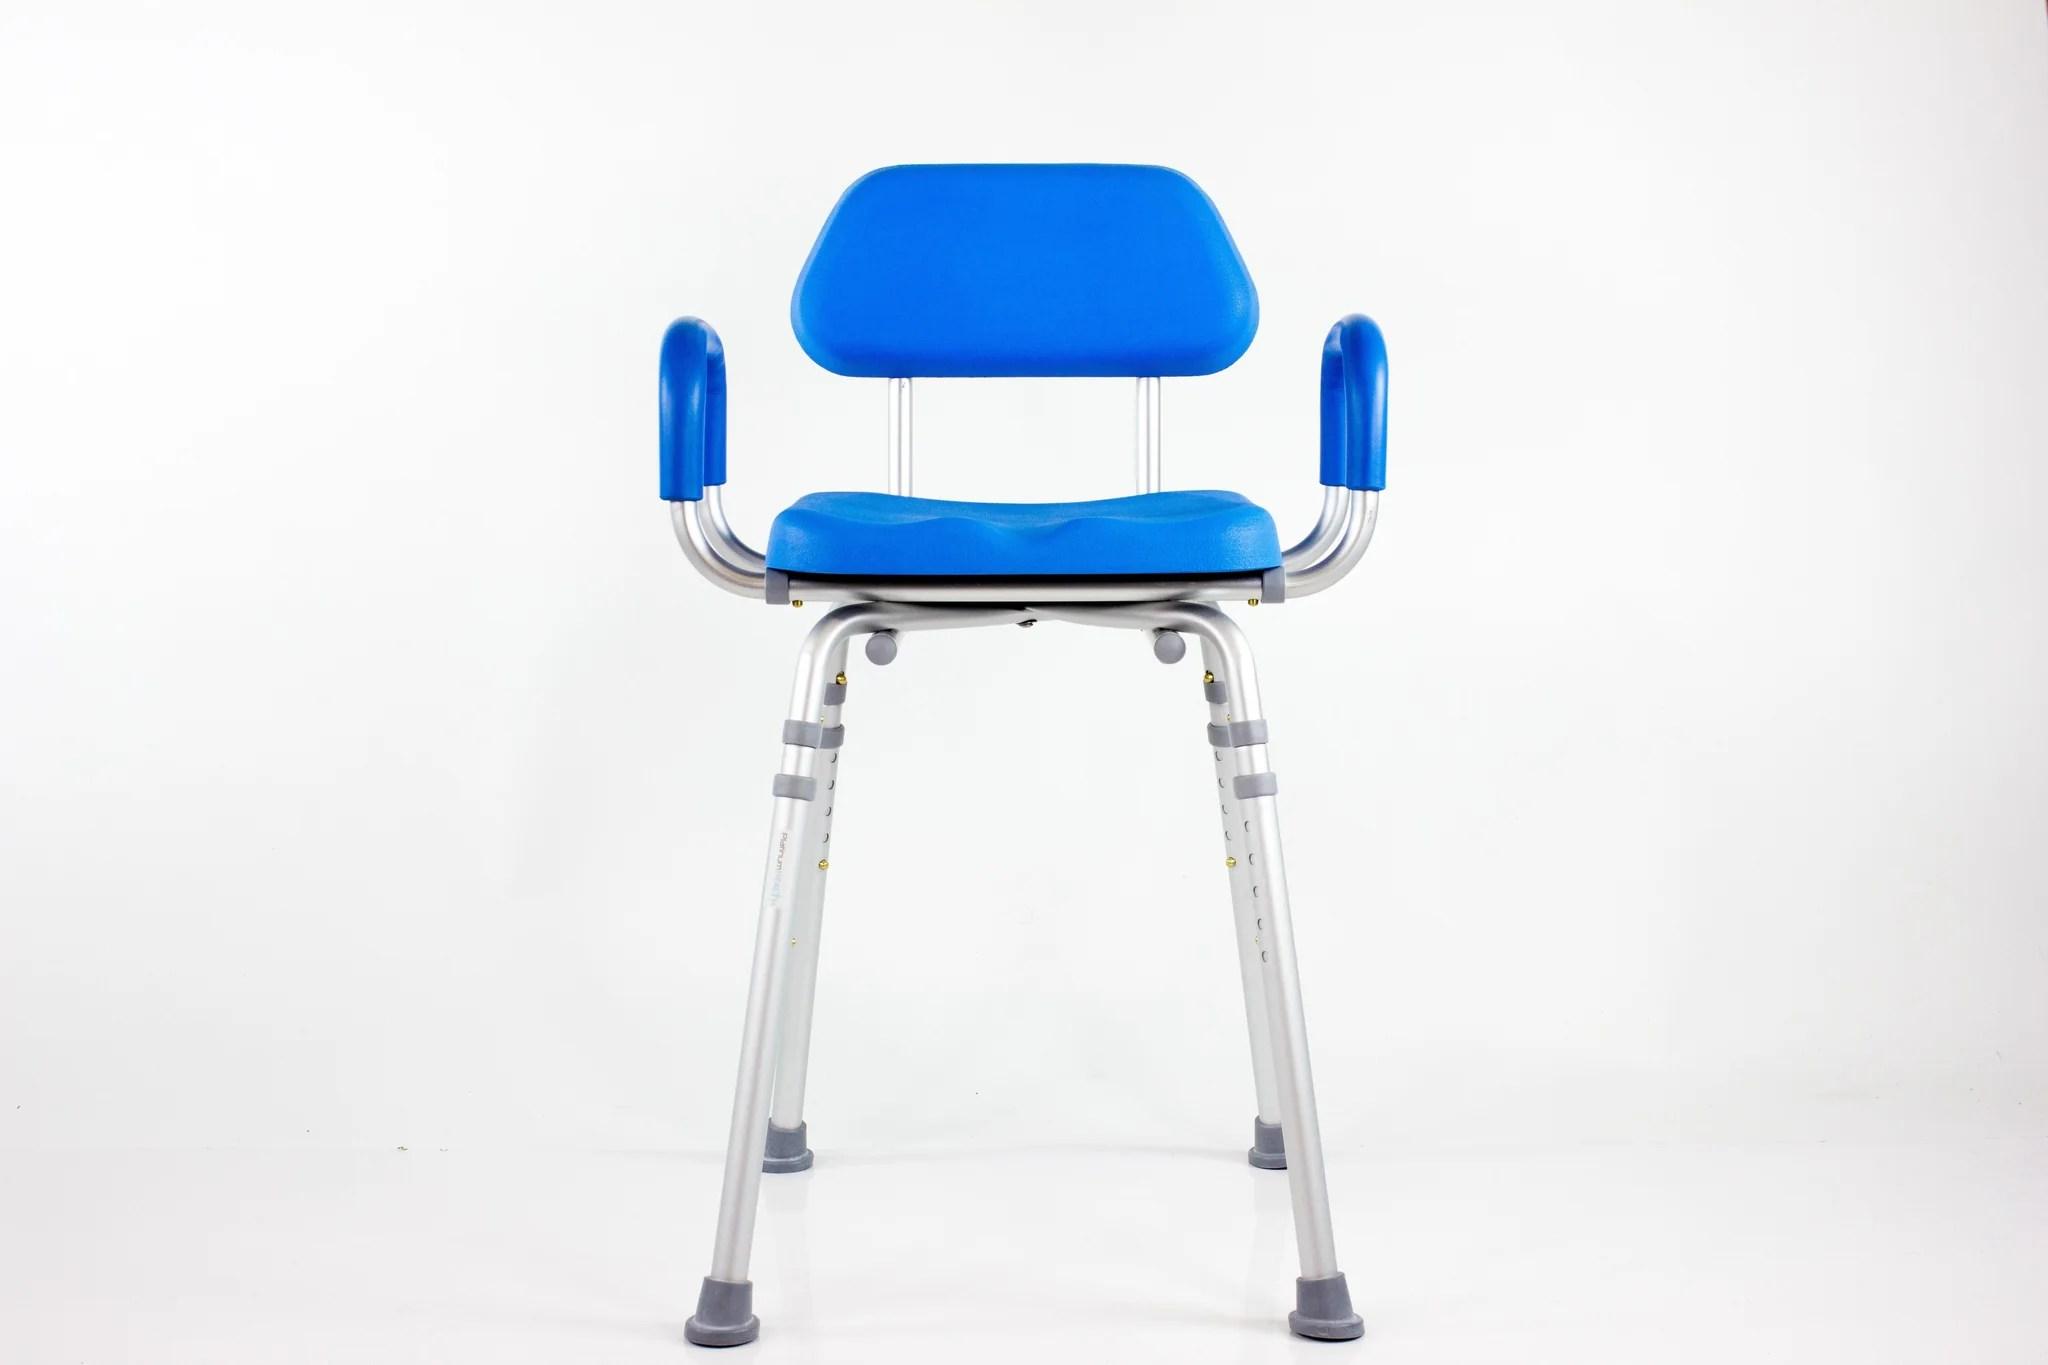 soft chairs spread the hips chair cover rentals alexandria va platinum health hip apex tm bath shower